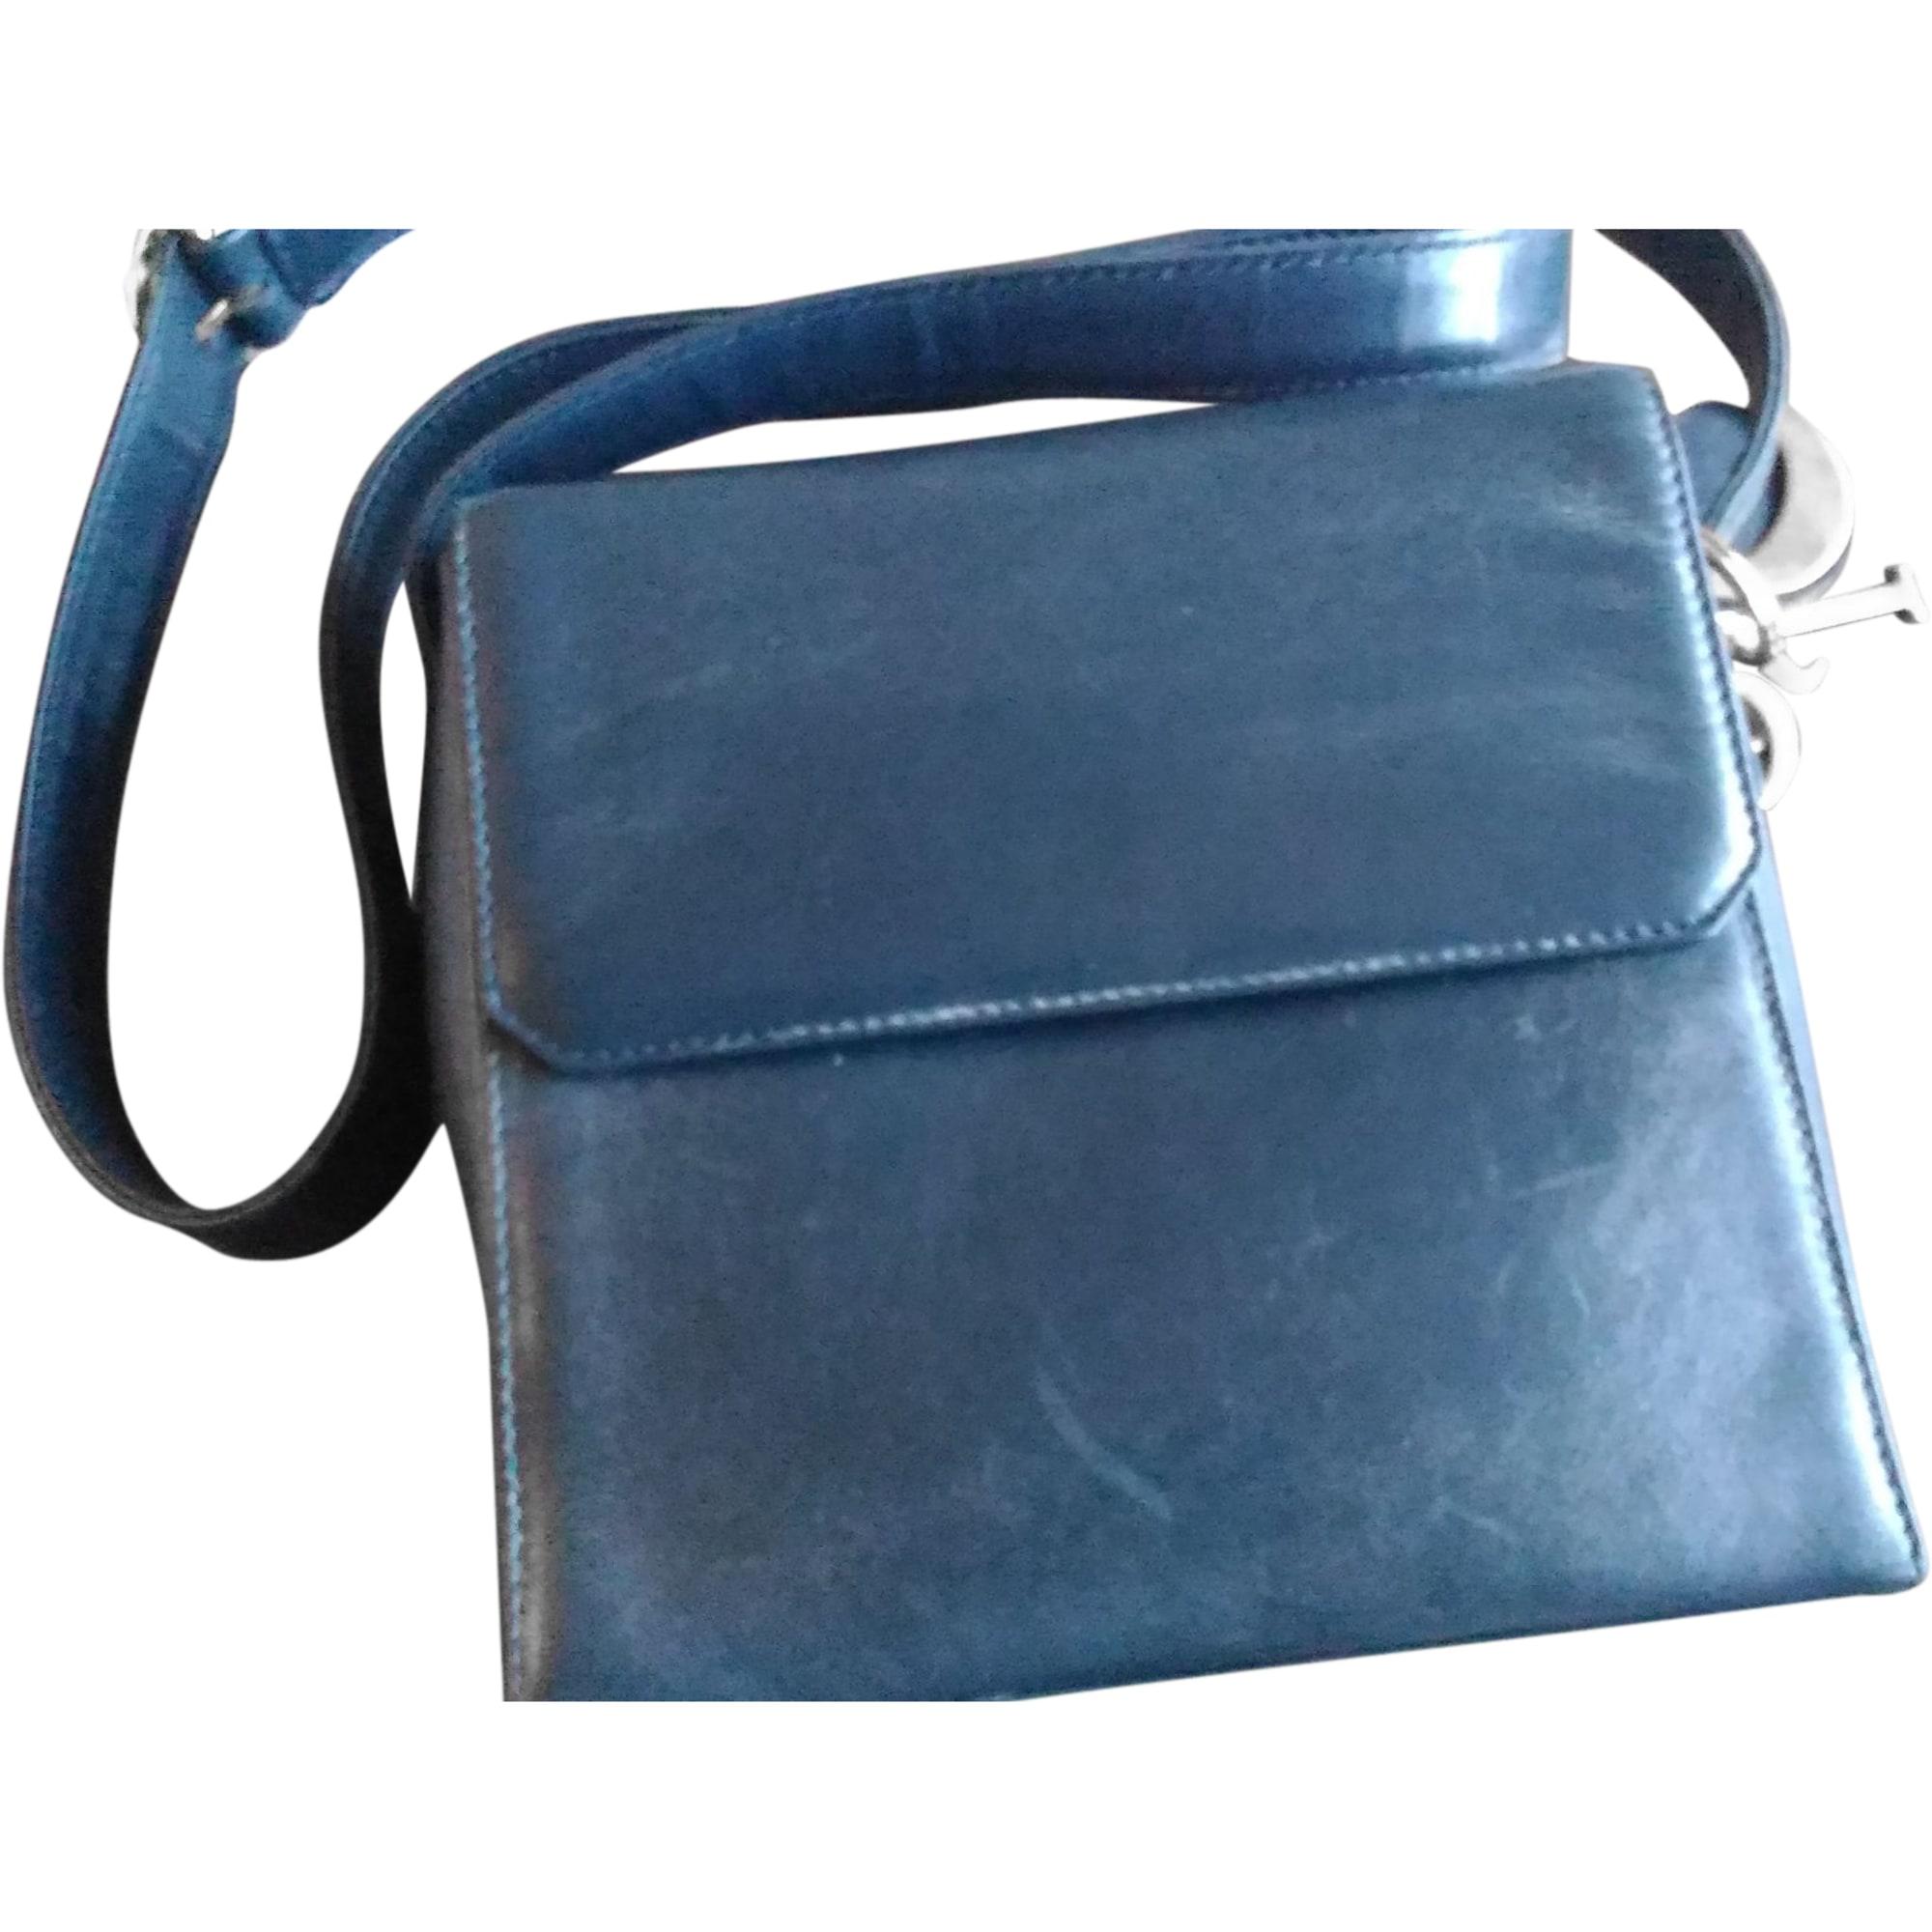 Sac en bandoulière en cuir DIOR Bleu, bleu marine, bleu turquoise